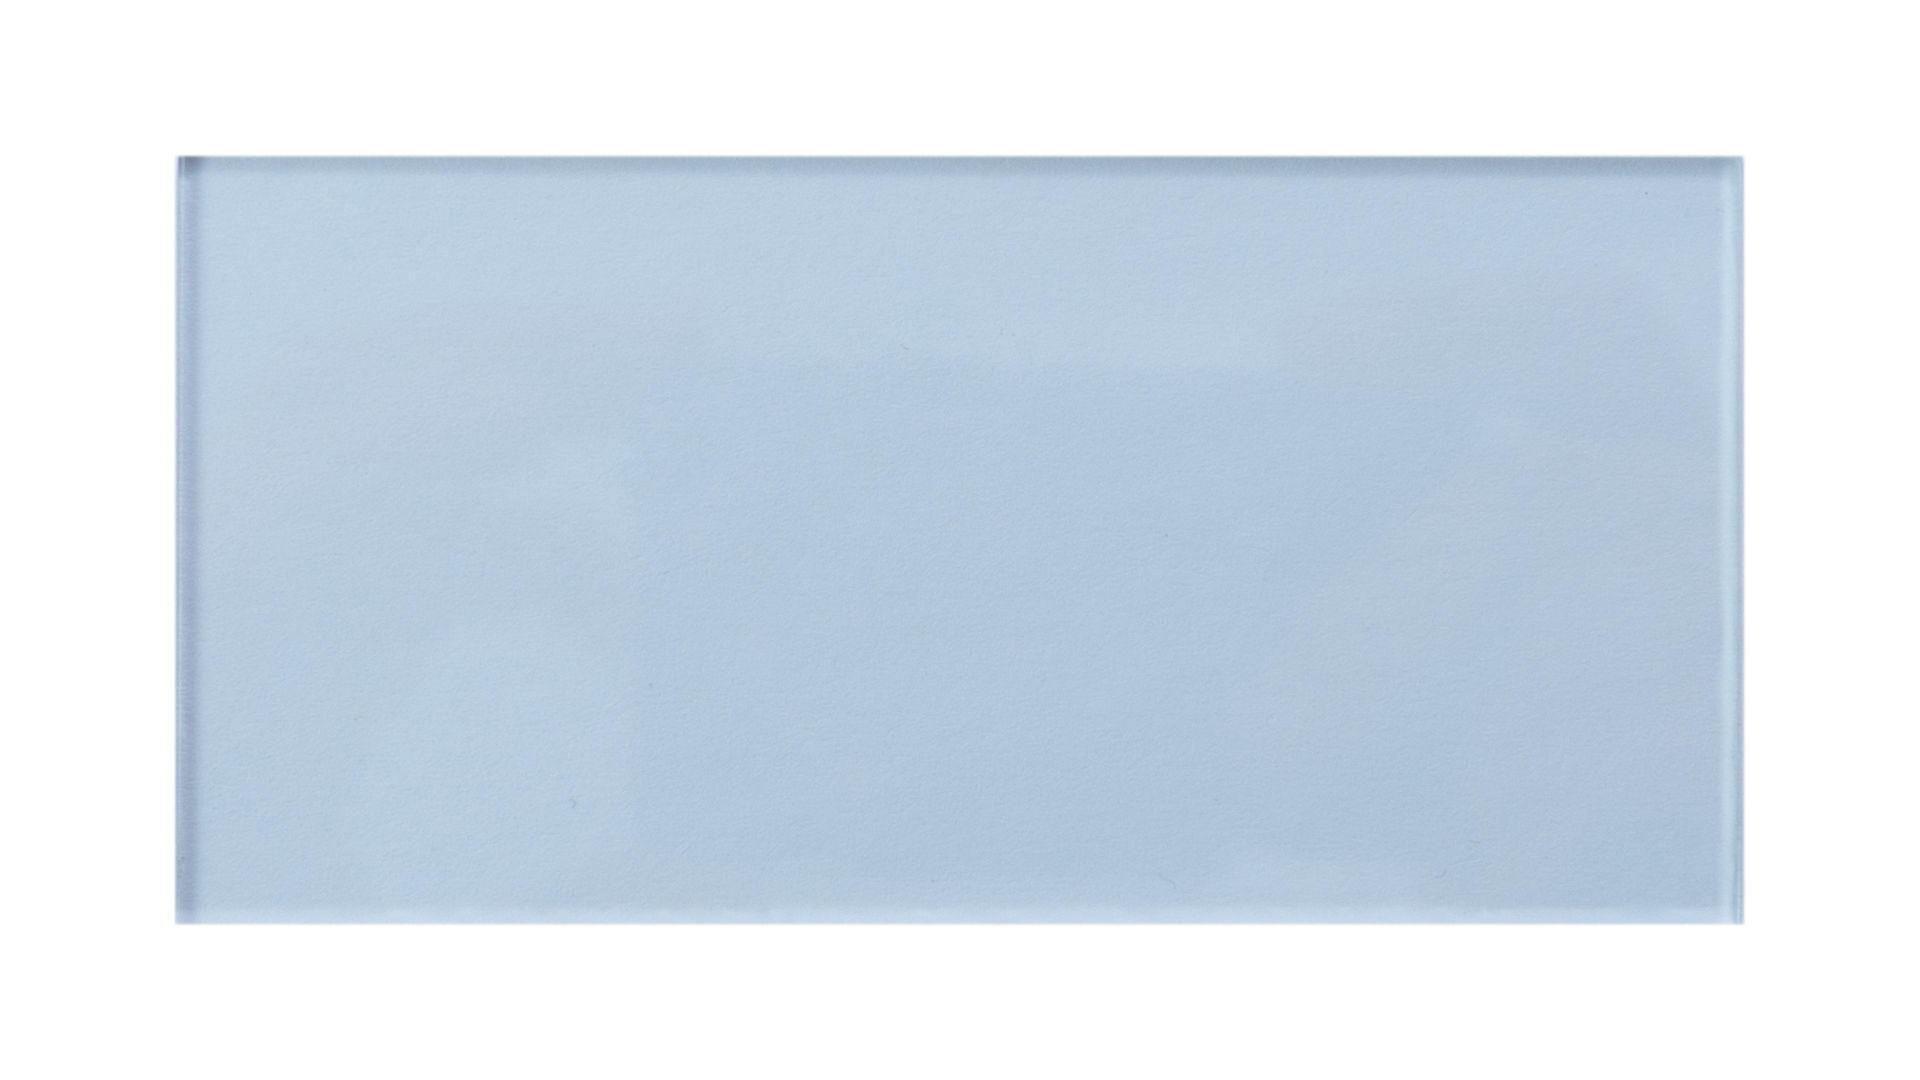 Стекло защитное для сварки Mastertool - 52 x 102 мм прозрачное 3